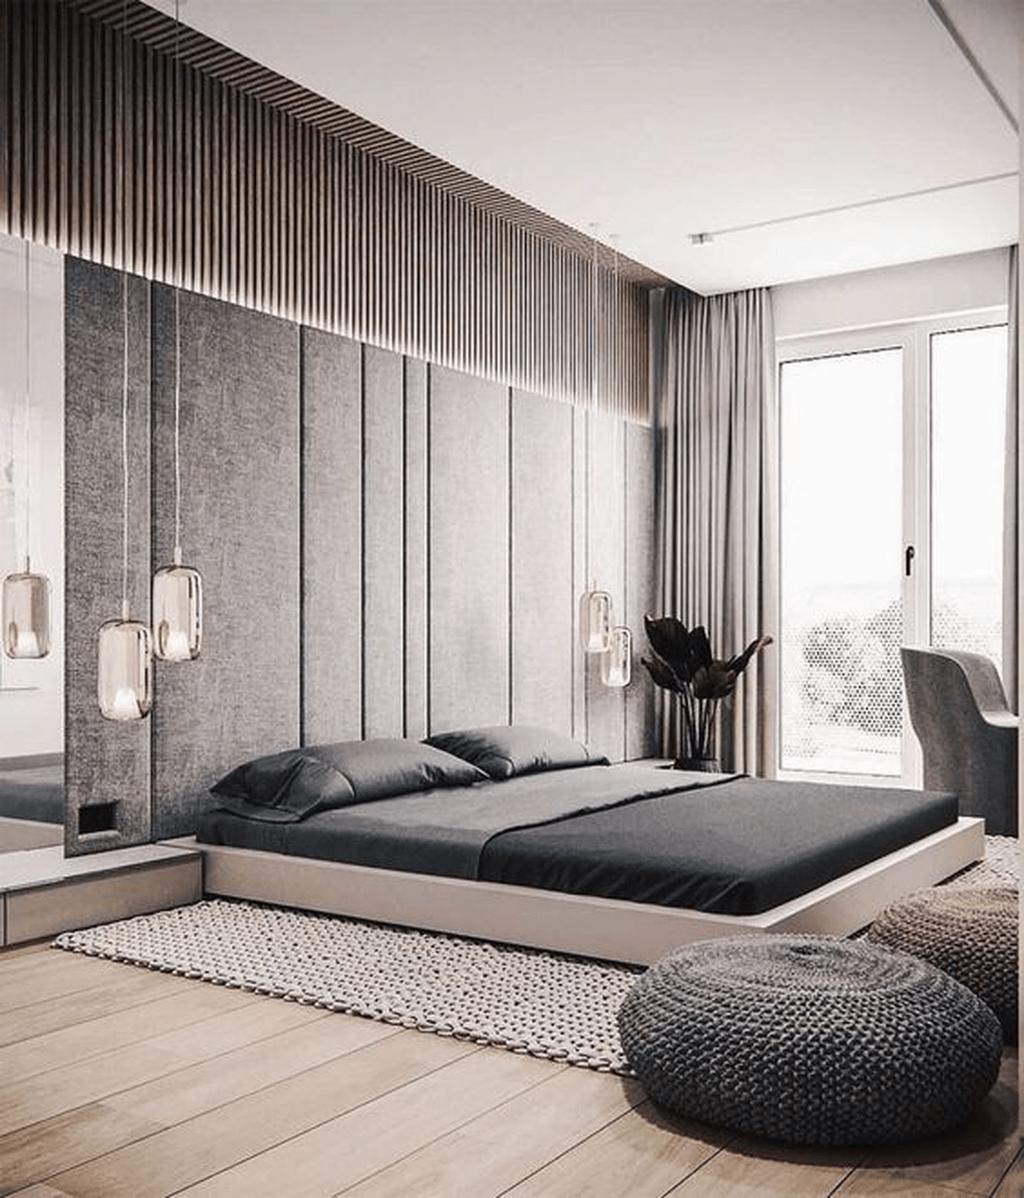 Gorgeous Modern Master Bedroom Design Ideas Modern Master Bedroom Design Bedroom Design Modern Master Bedroom